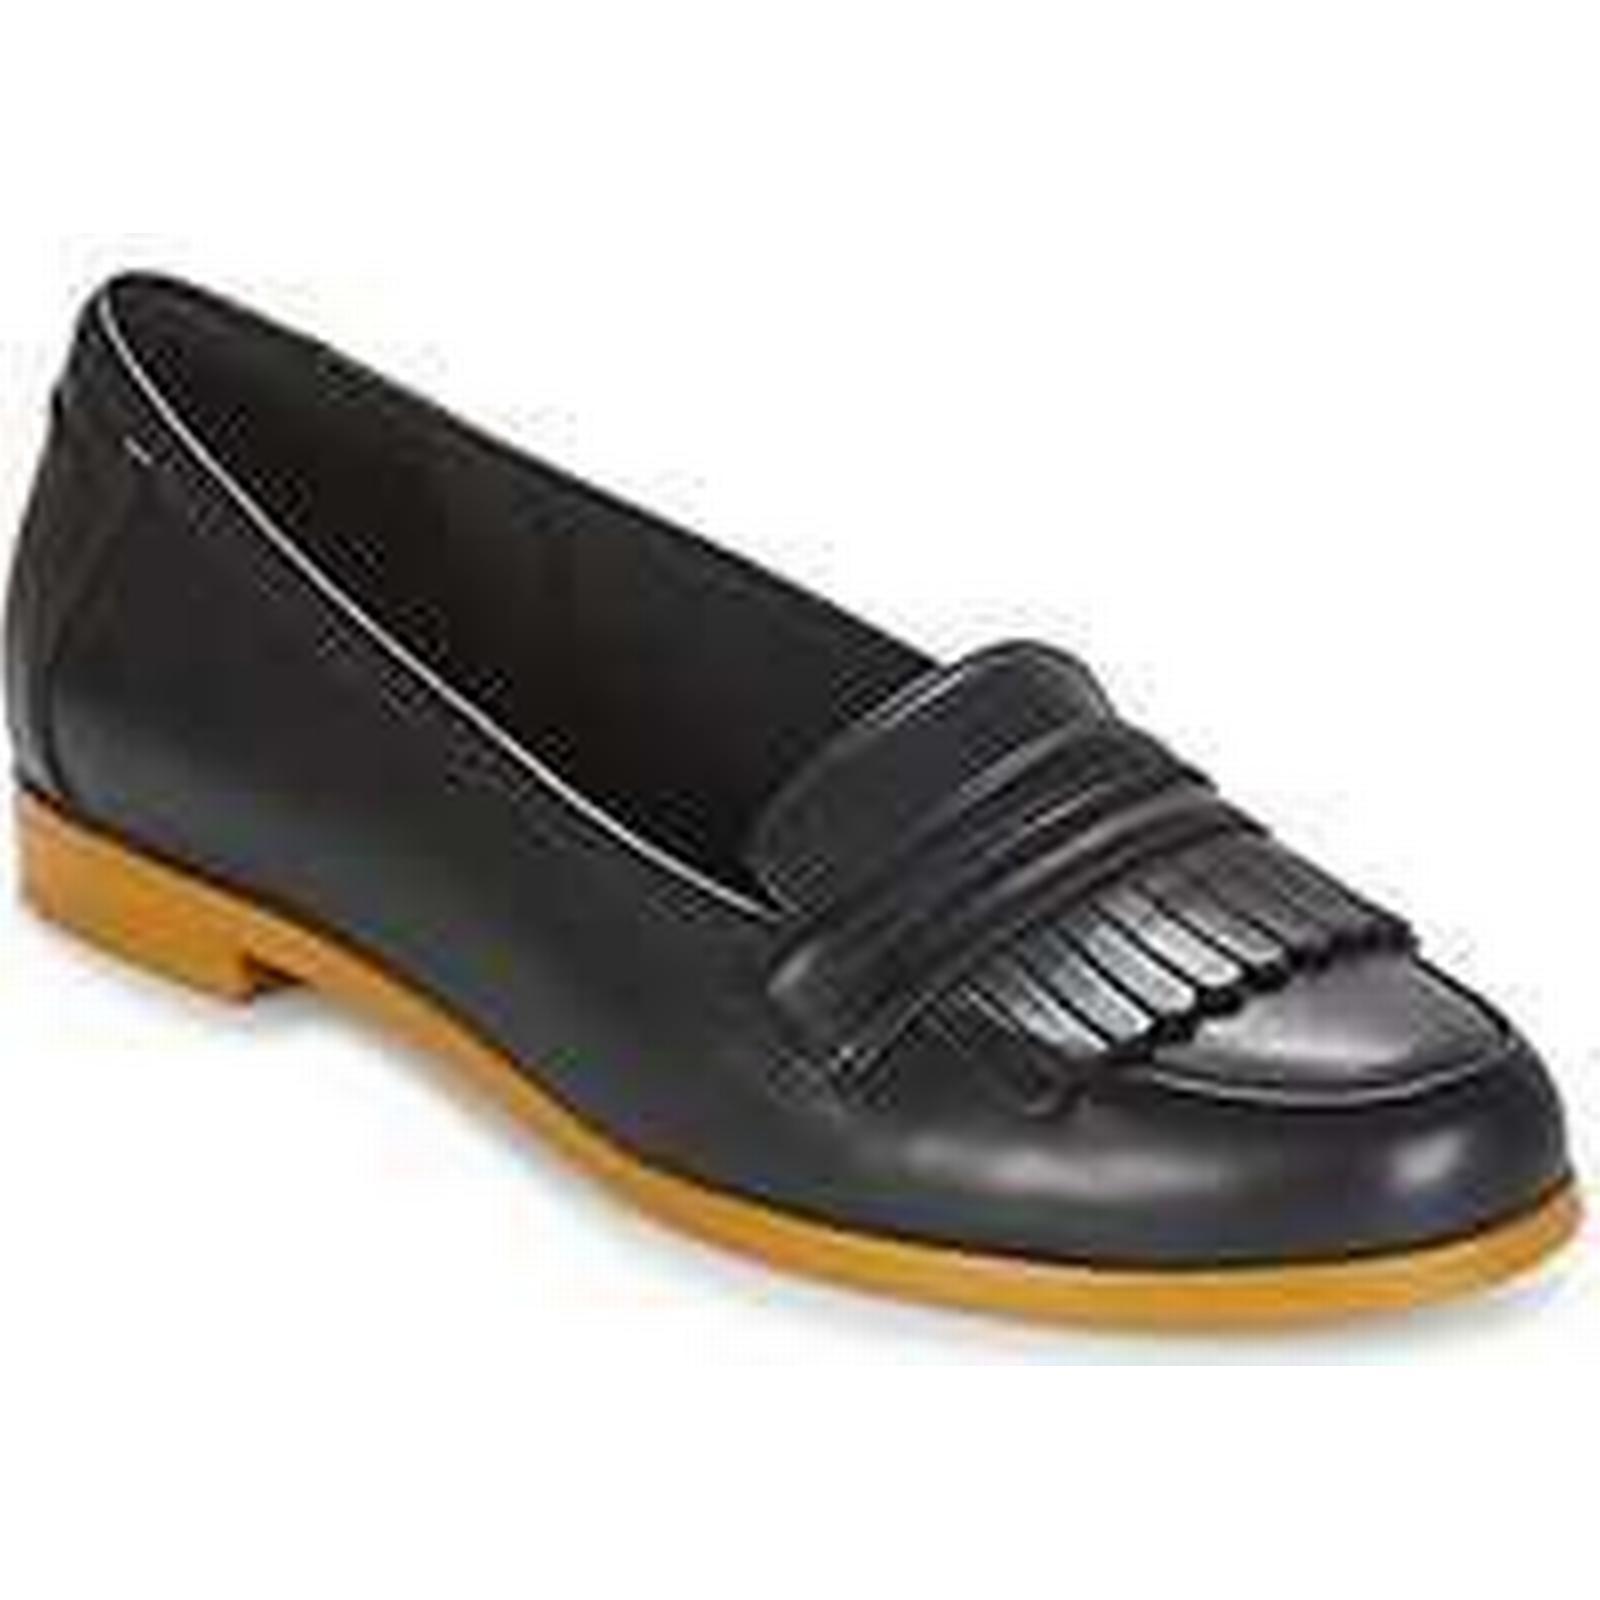 Spartoo.co.uk Clarks ANDORA CRUSH women's in Shoes (Pumps / Ballerinas) in women's Black ce3bf2